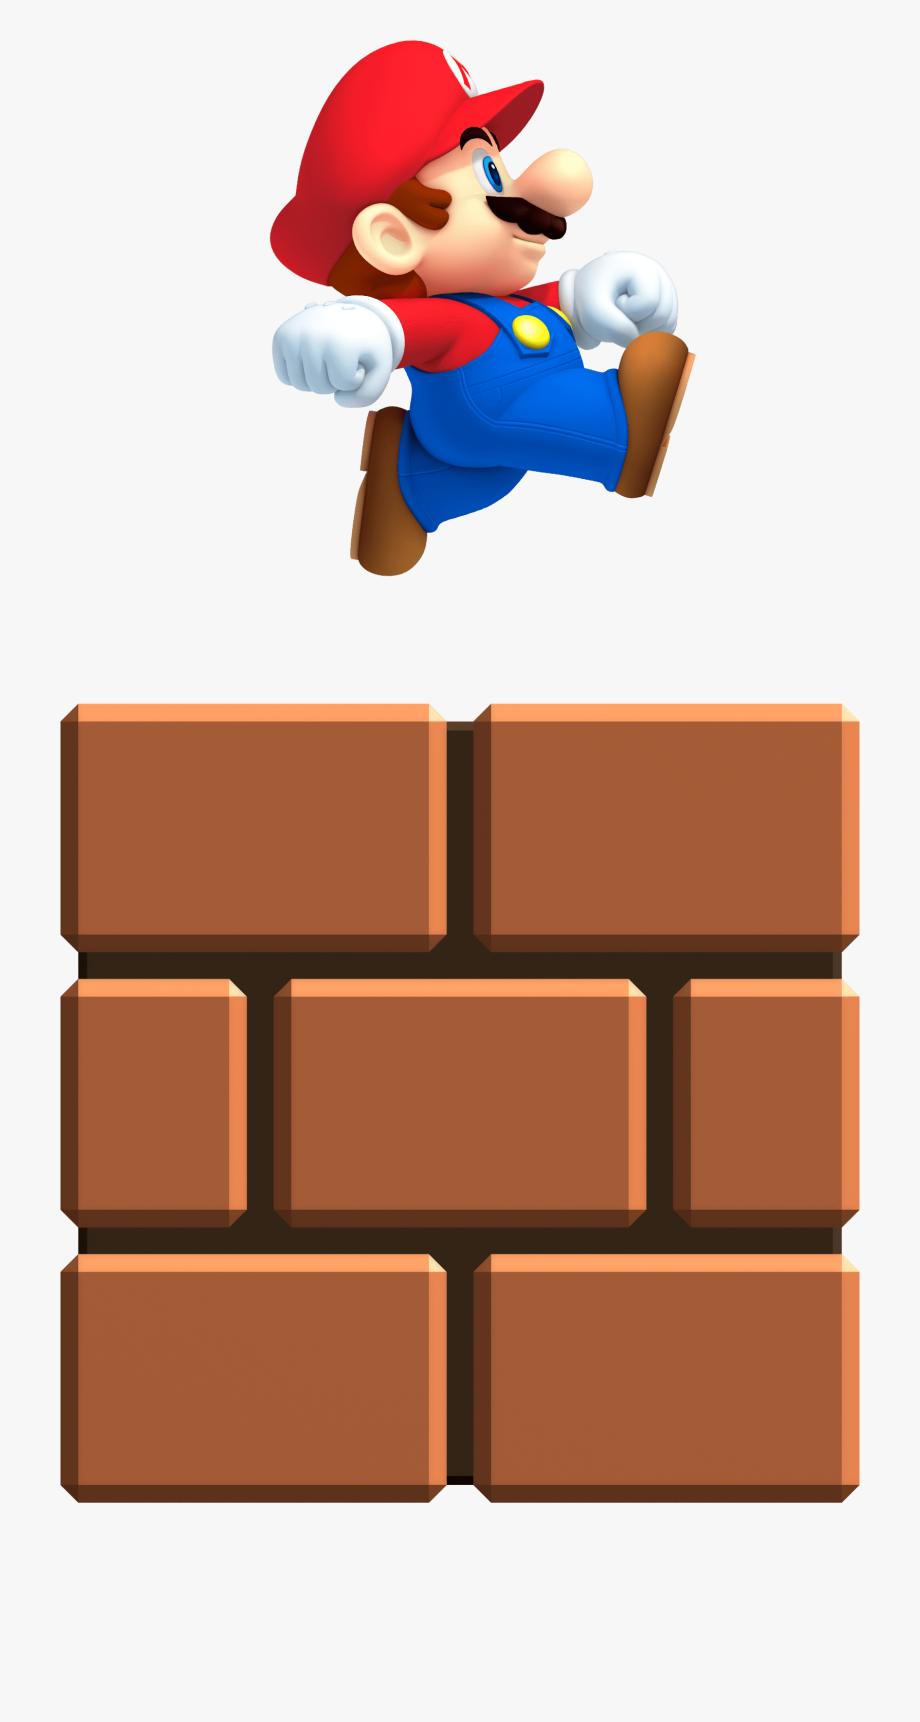 Brick Clipart Super Mario Pencil And In Color Brick.